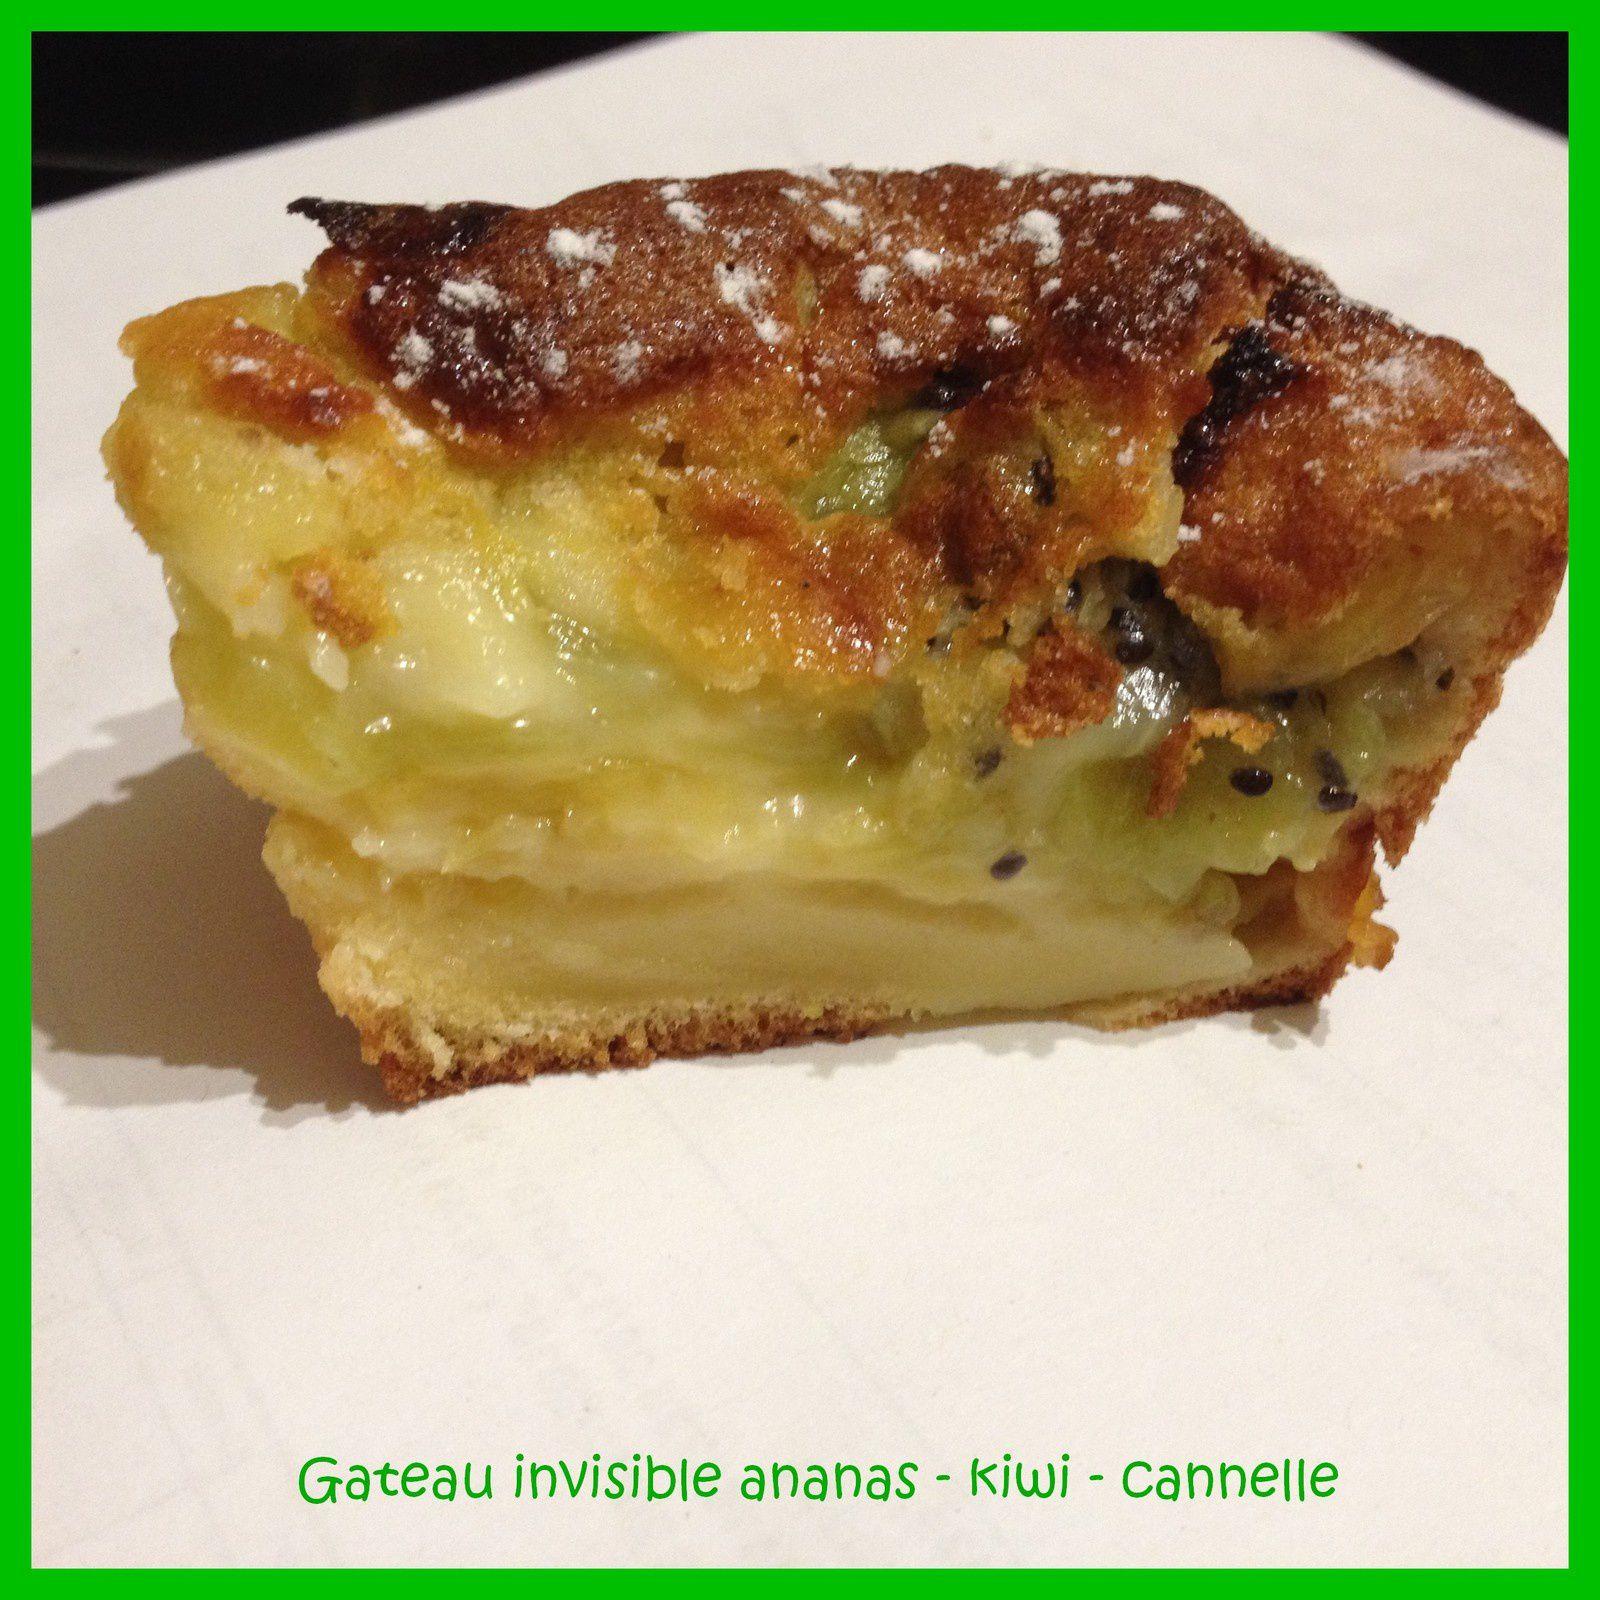 Gâteau invisible ananas - kiwi et cannelle